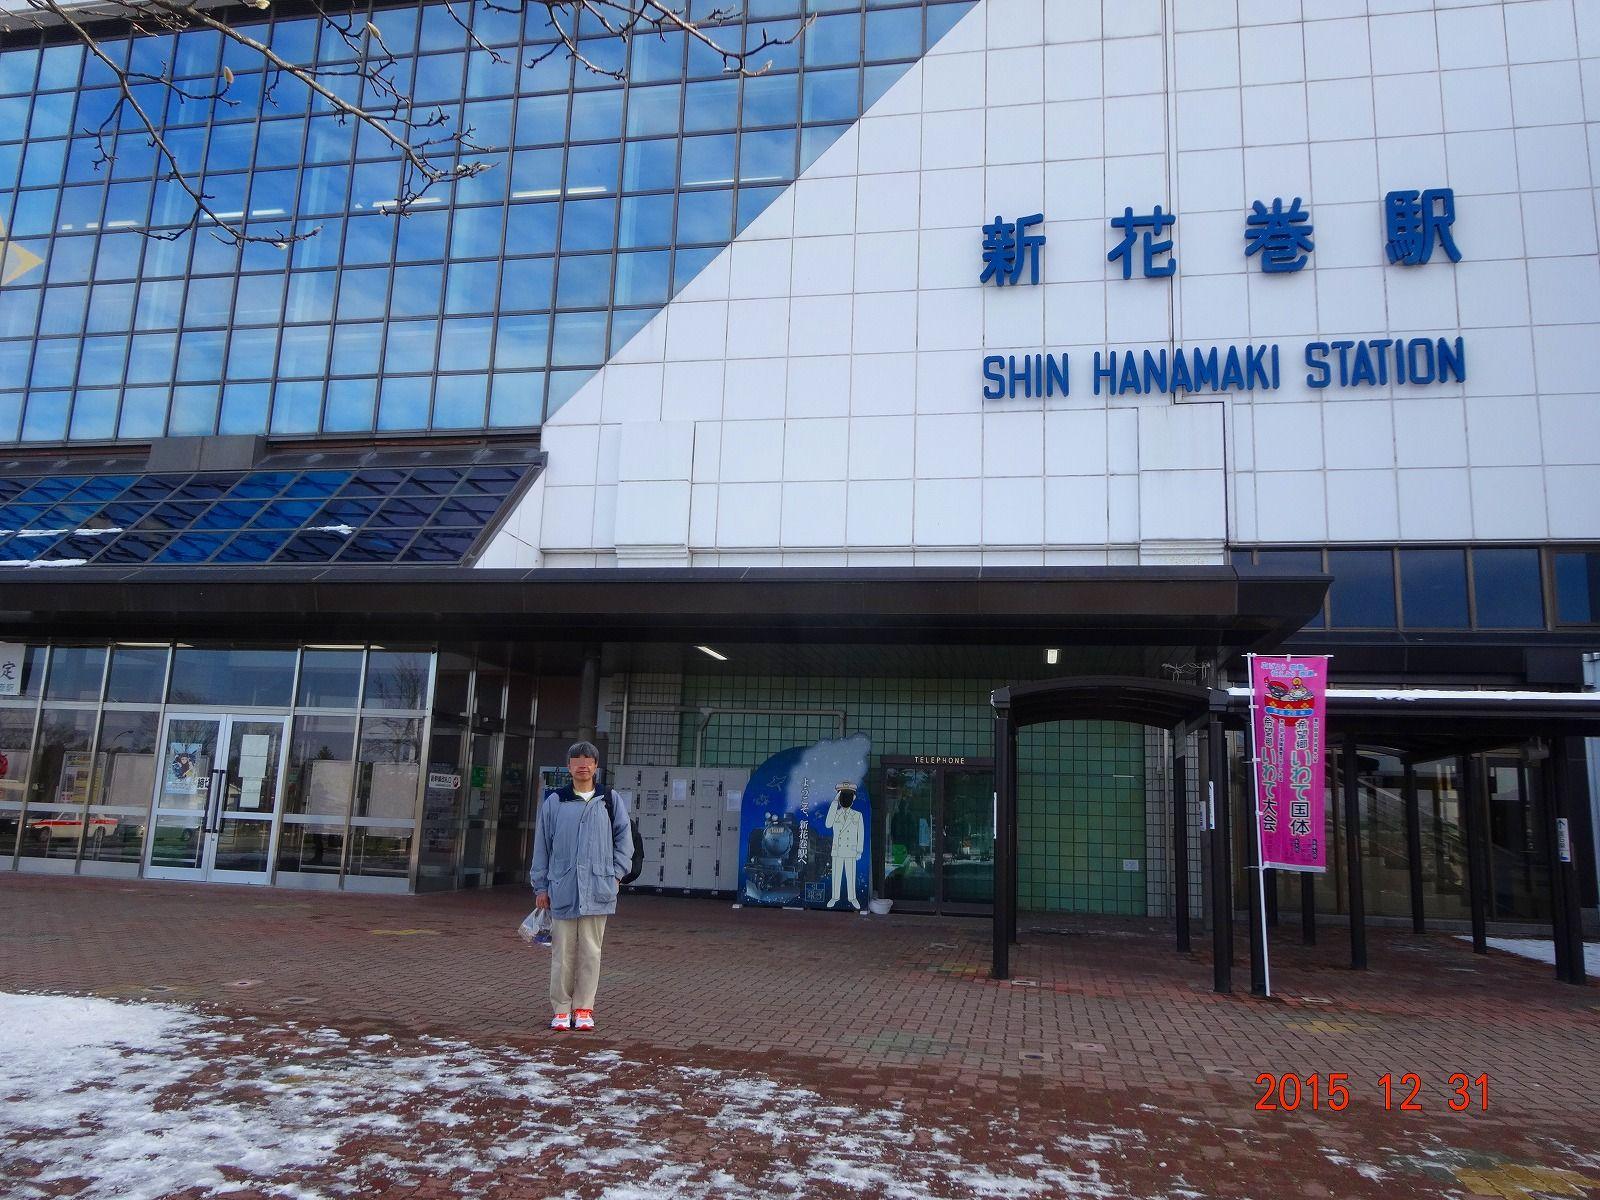 http://mafutan.com/marutanikki/2015/12/31/oosawa%20%2871%29.jpg